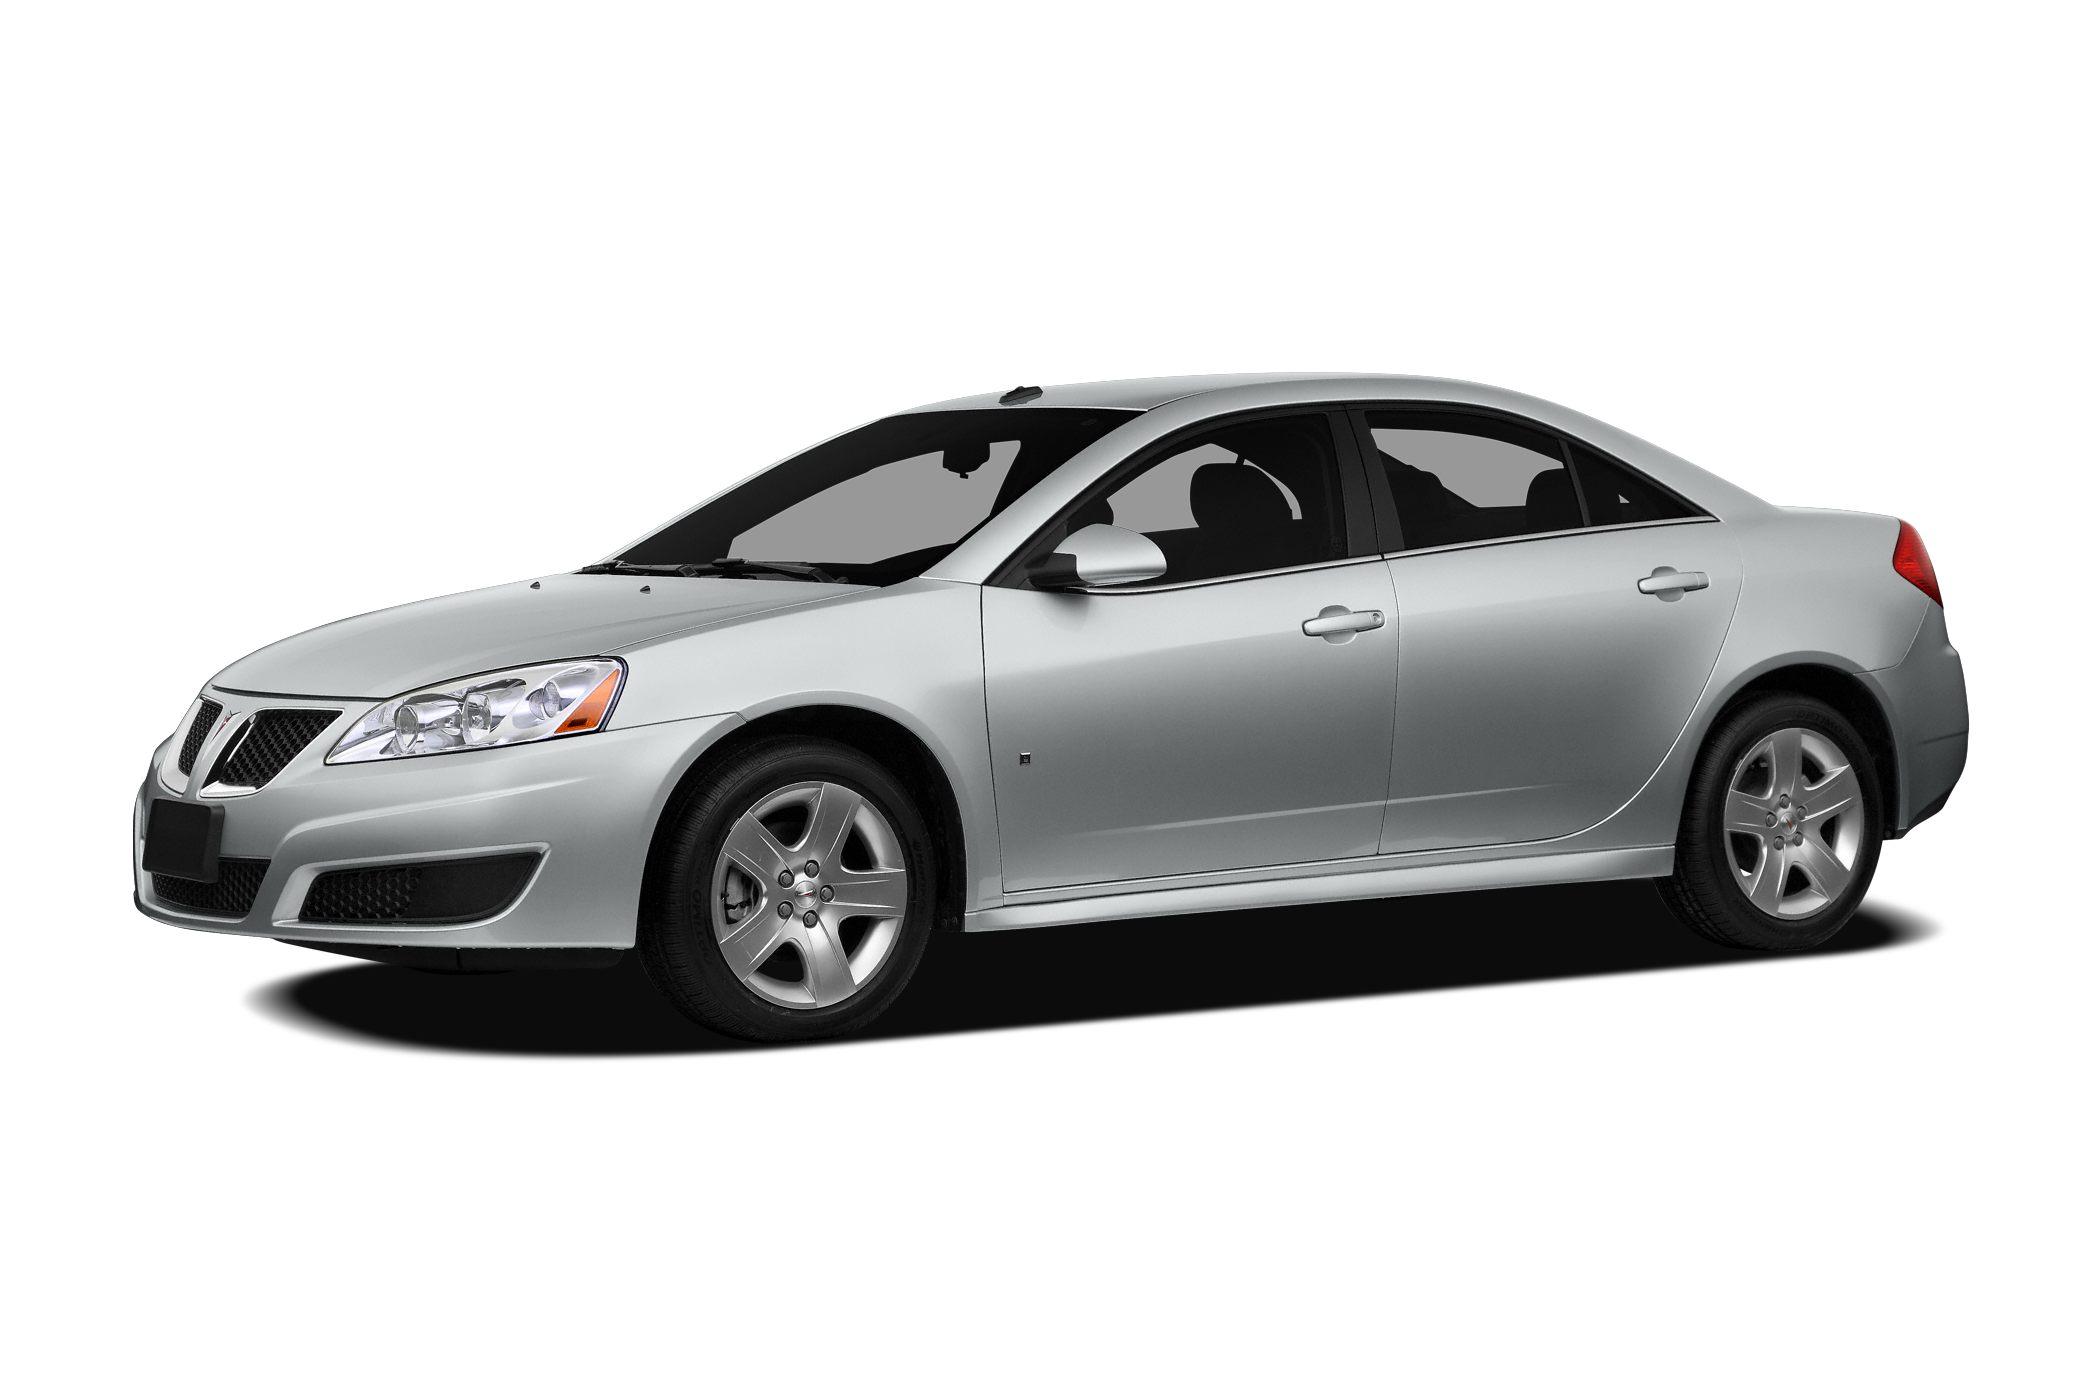 2009 Pontiac G6  Miles 87961Stock 94267953 VIN 1G2ZJ57B494267953